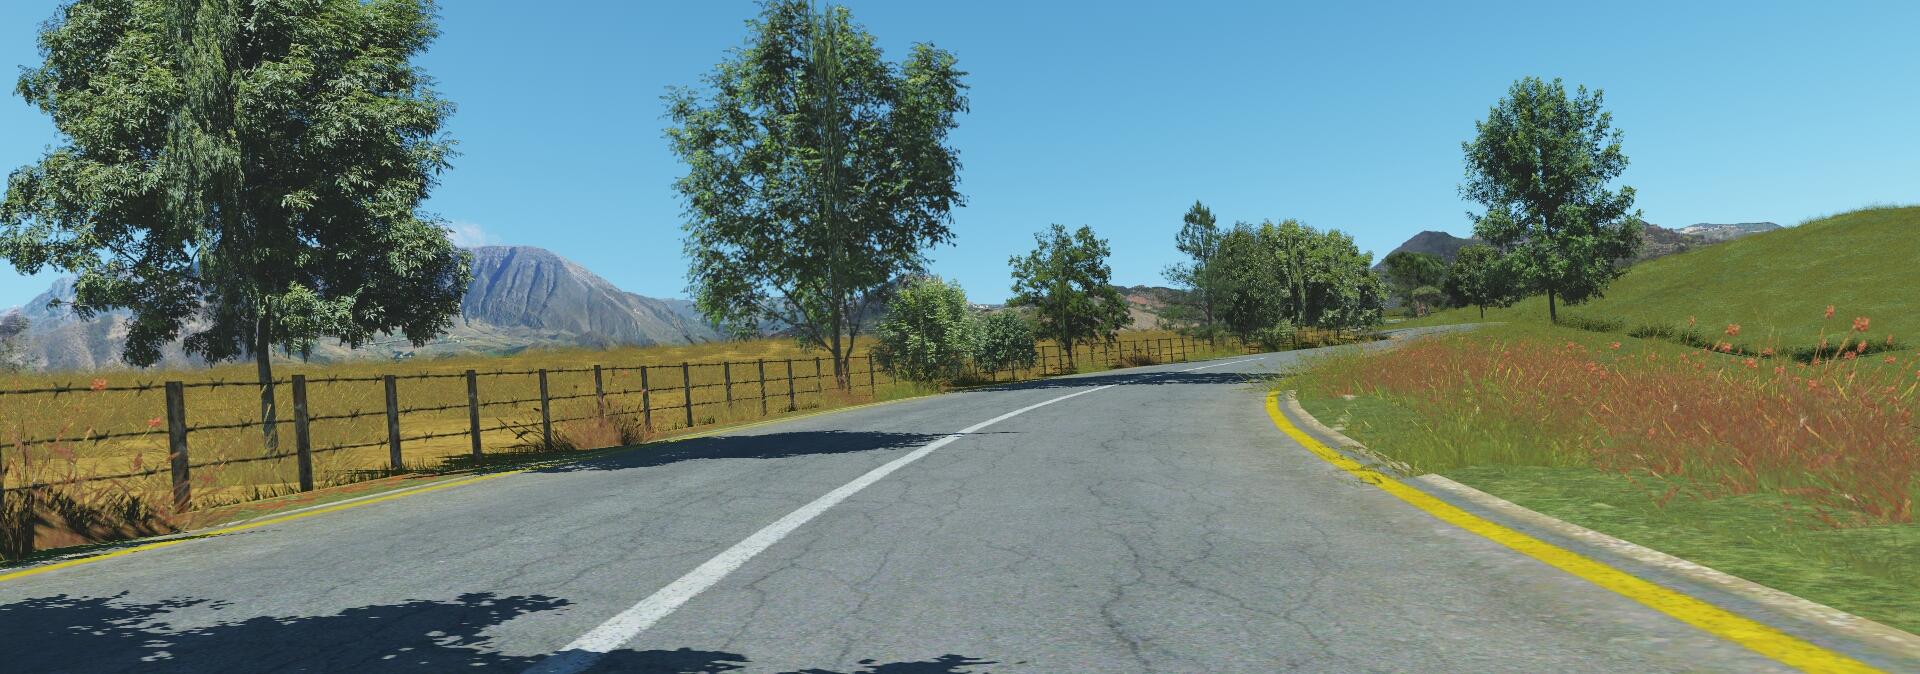 365960_20201217202539_1 Targa Florio 0.28 for rFactor 2 – Released